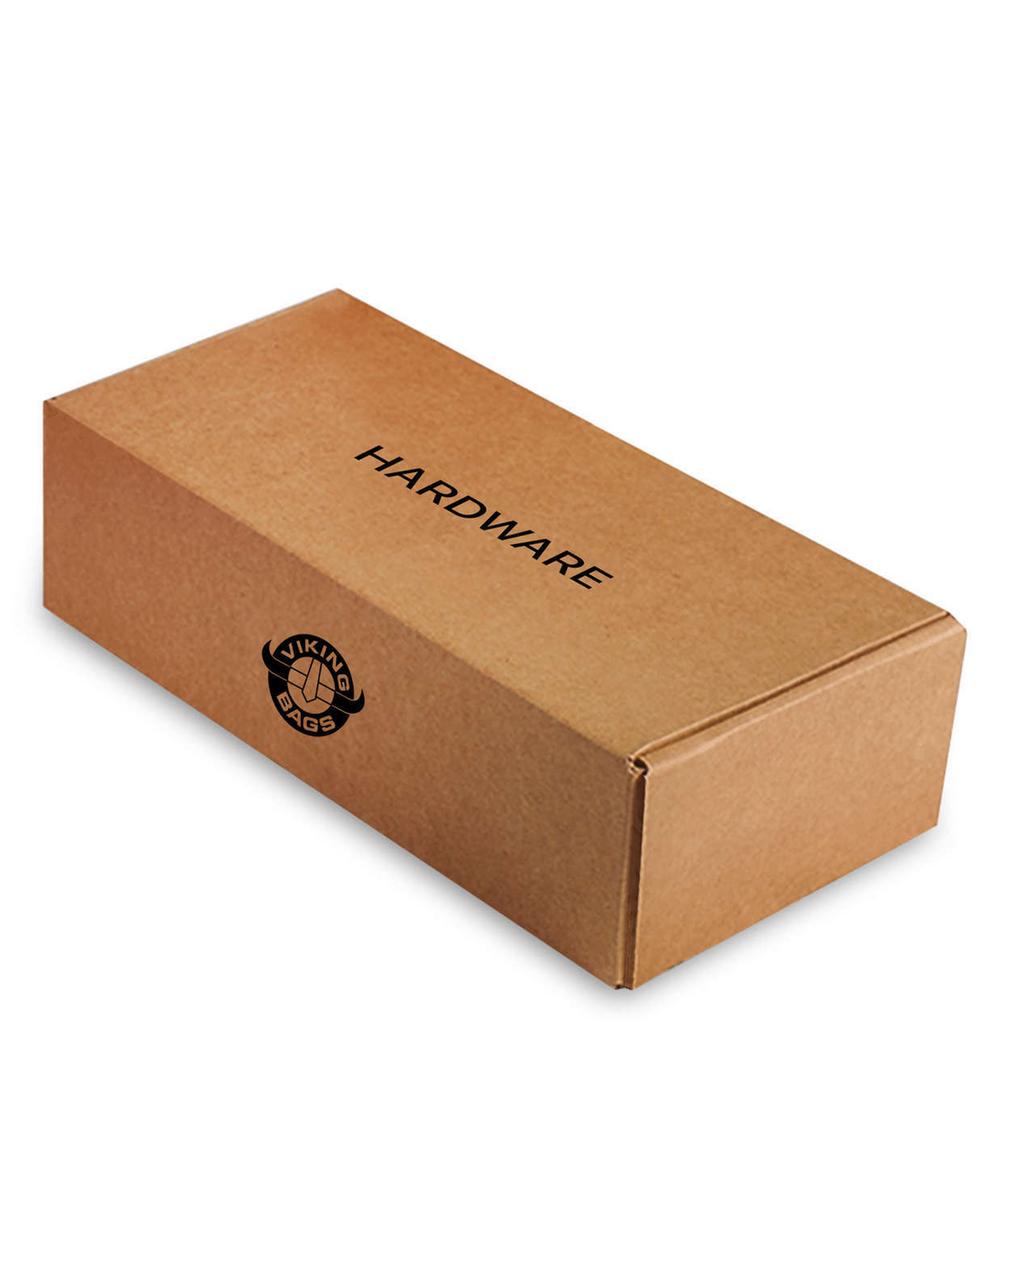 Honda VTX 1300 C Viking Lamellar Leather Covered Shock Cutout Hard Saddlebag Hardware Box